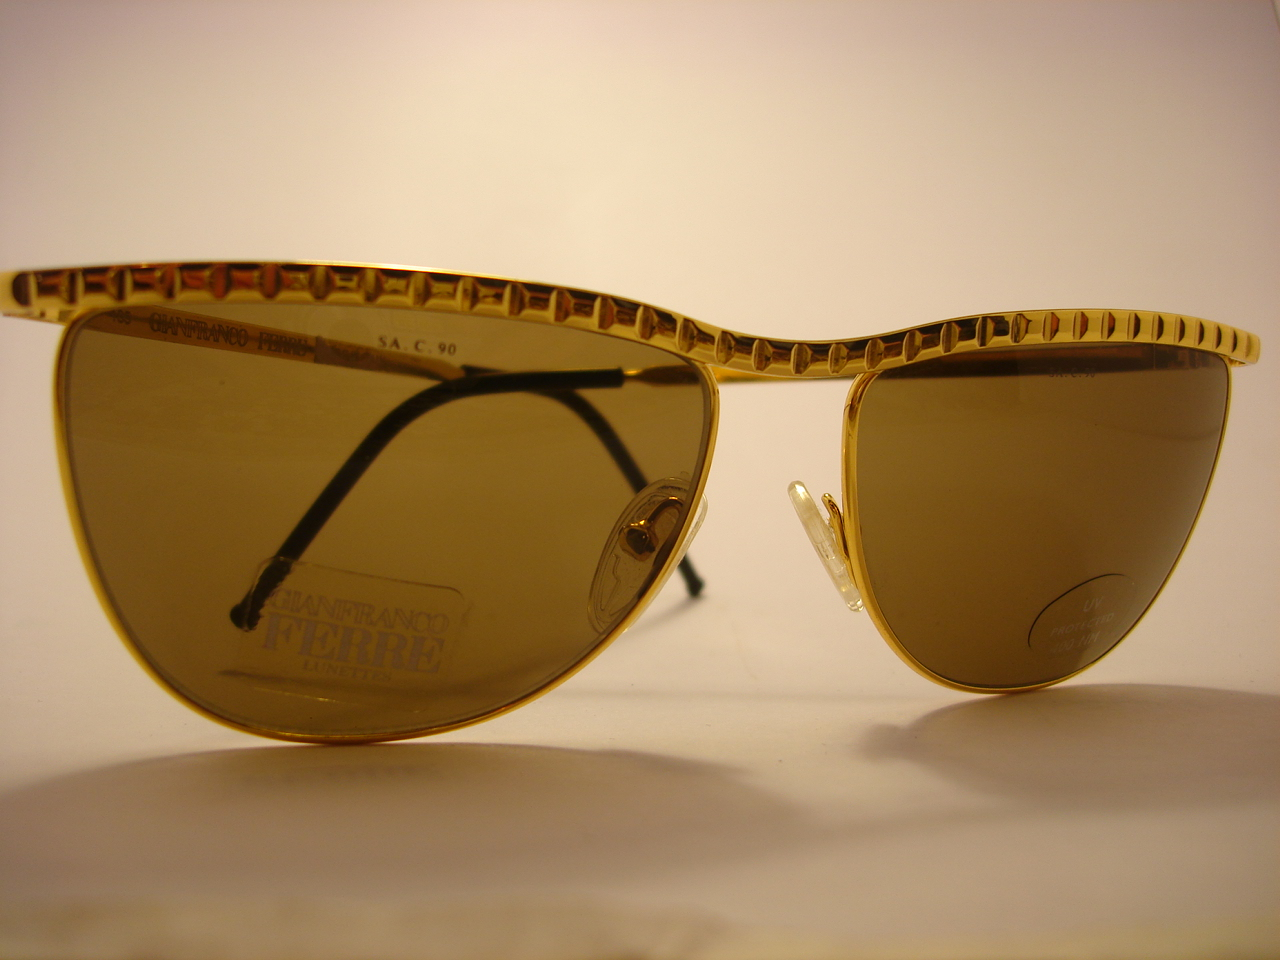 c78ef880f42 Gianfranco Ferre Sunglasses 2013 « Heritage Malta